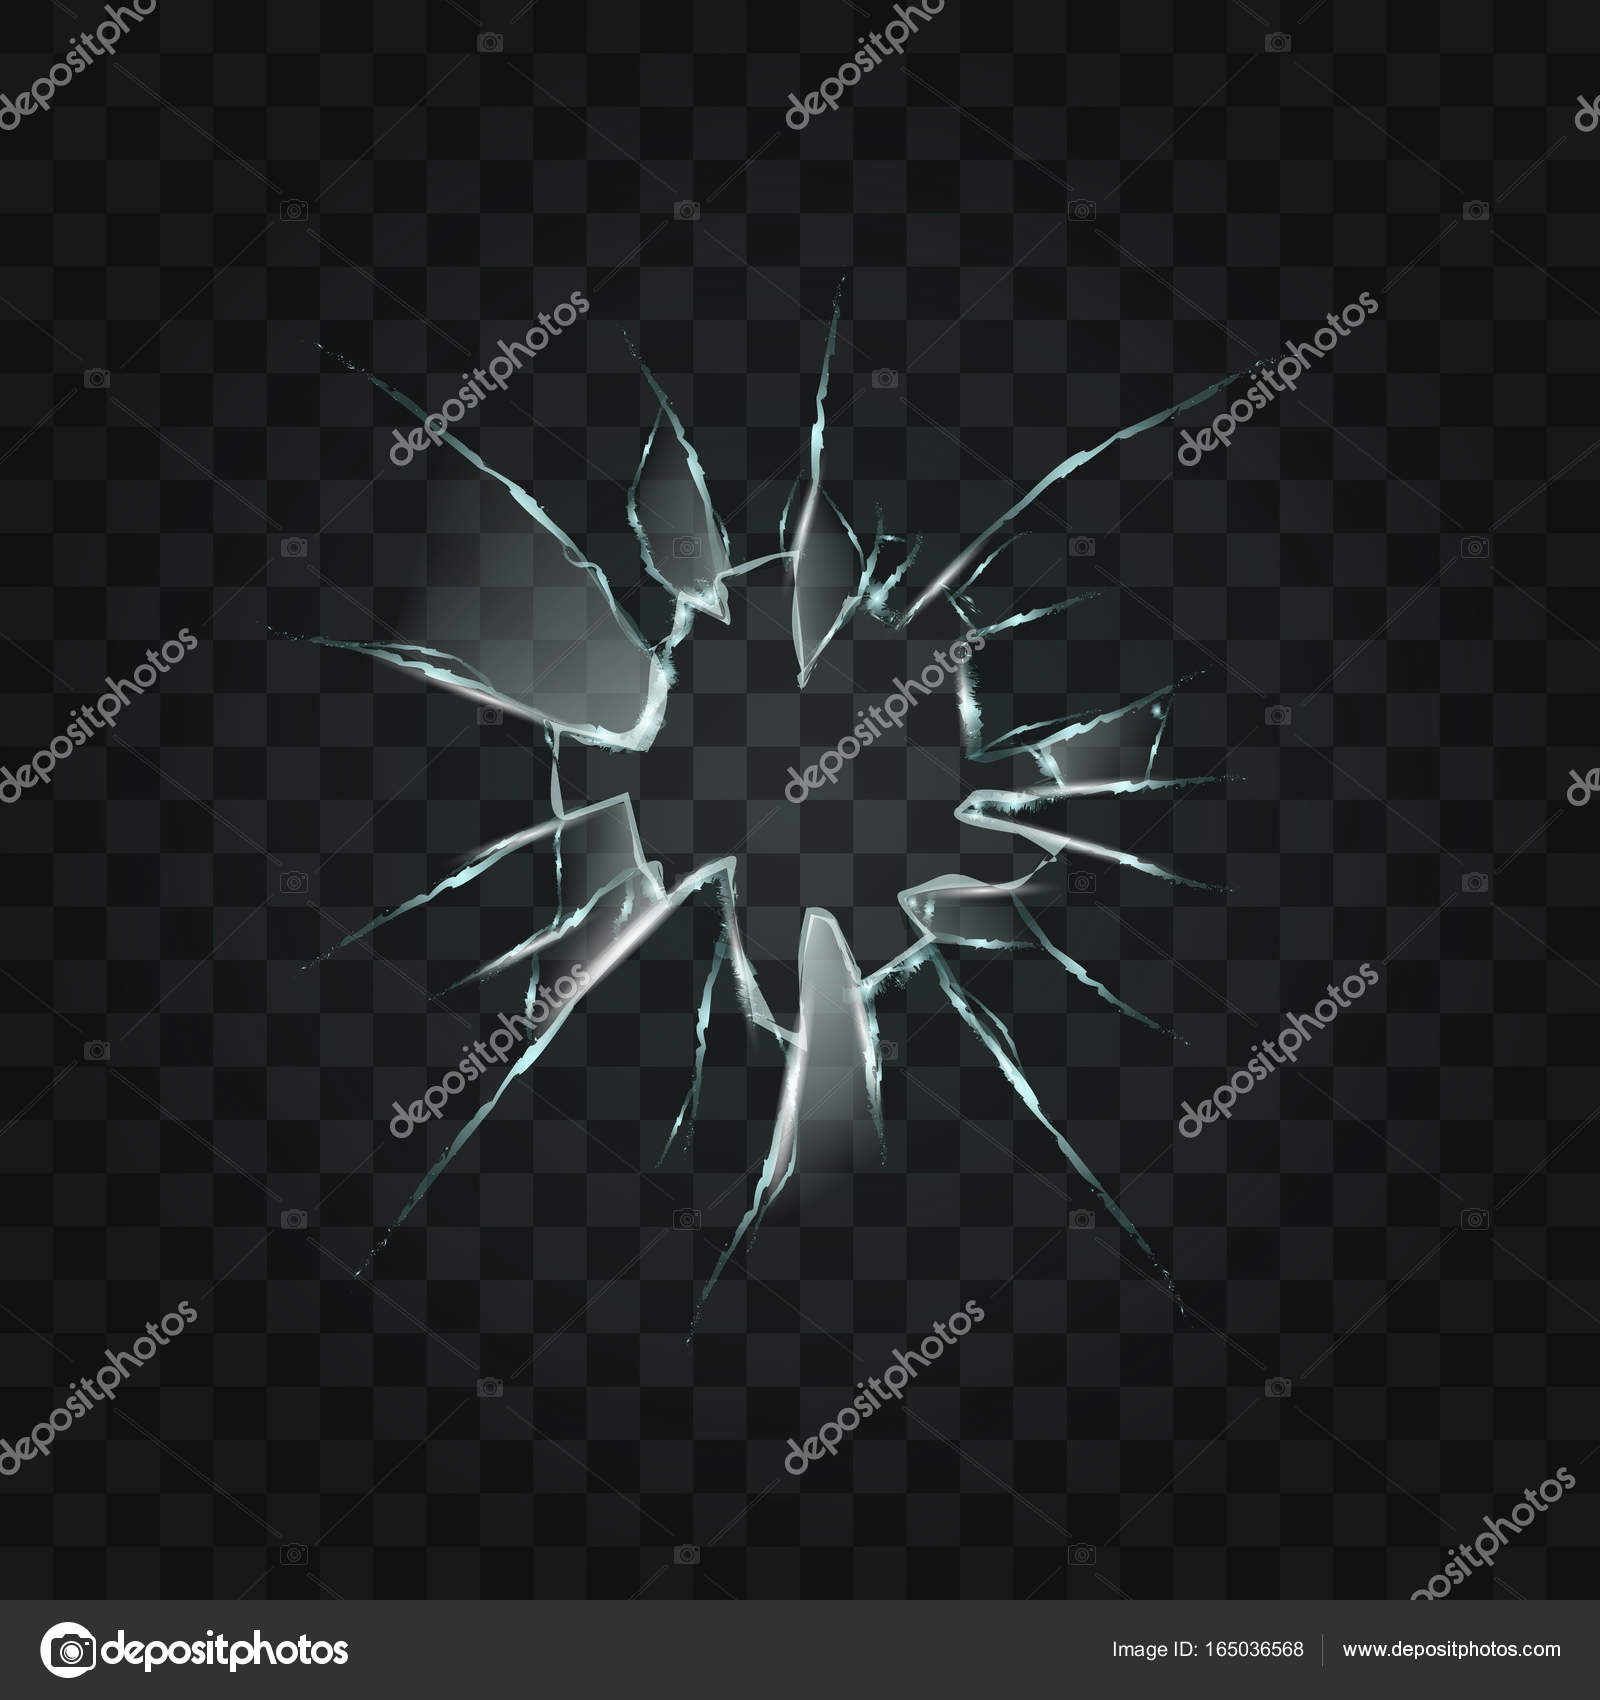 Genoeg Gebroken raam gat transparant glas — Stockvector © prahprah #165036568 IZ09